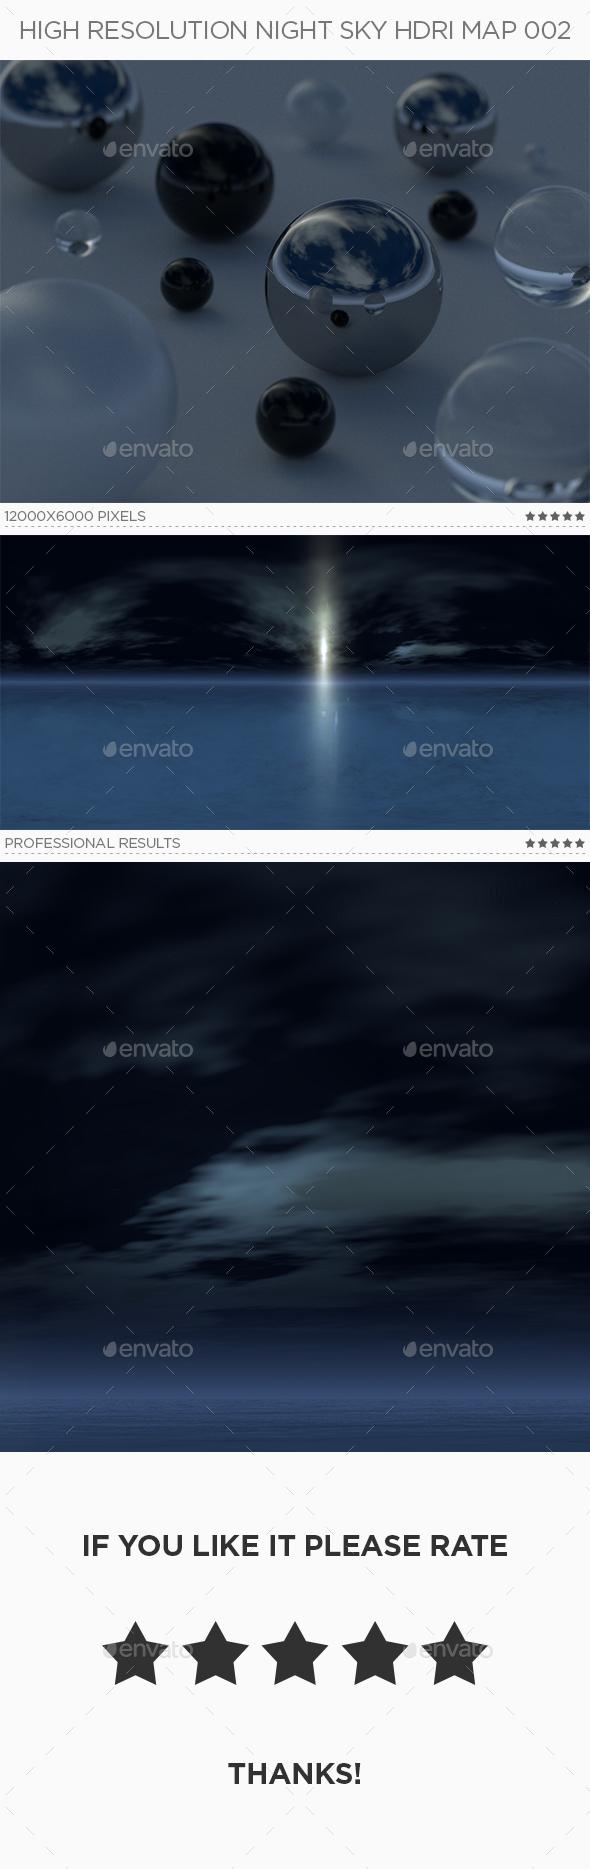 High Resolution Night Sky HDRi Map 002 - 3DOcean Item for Sale